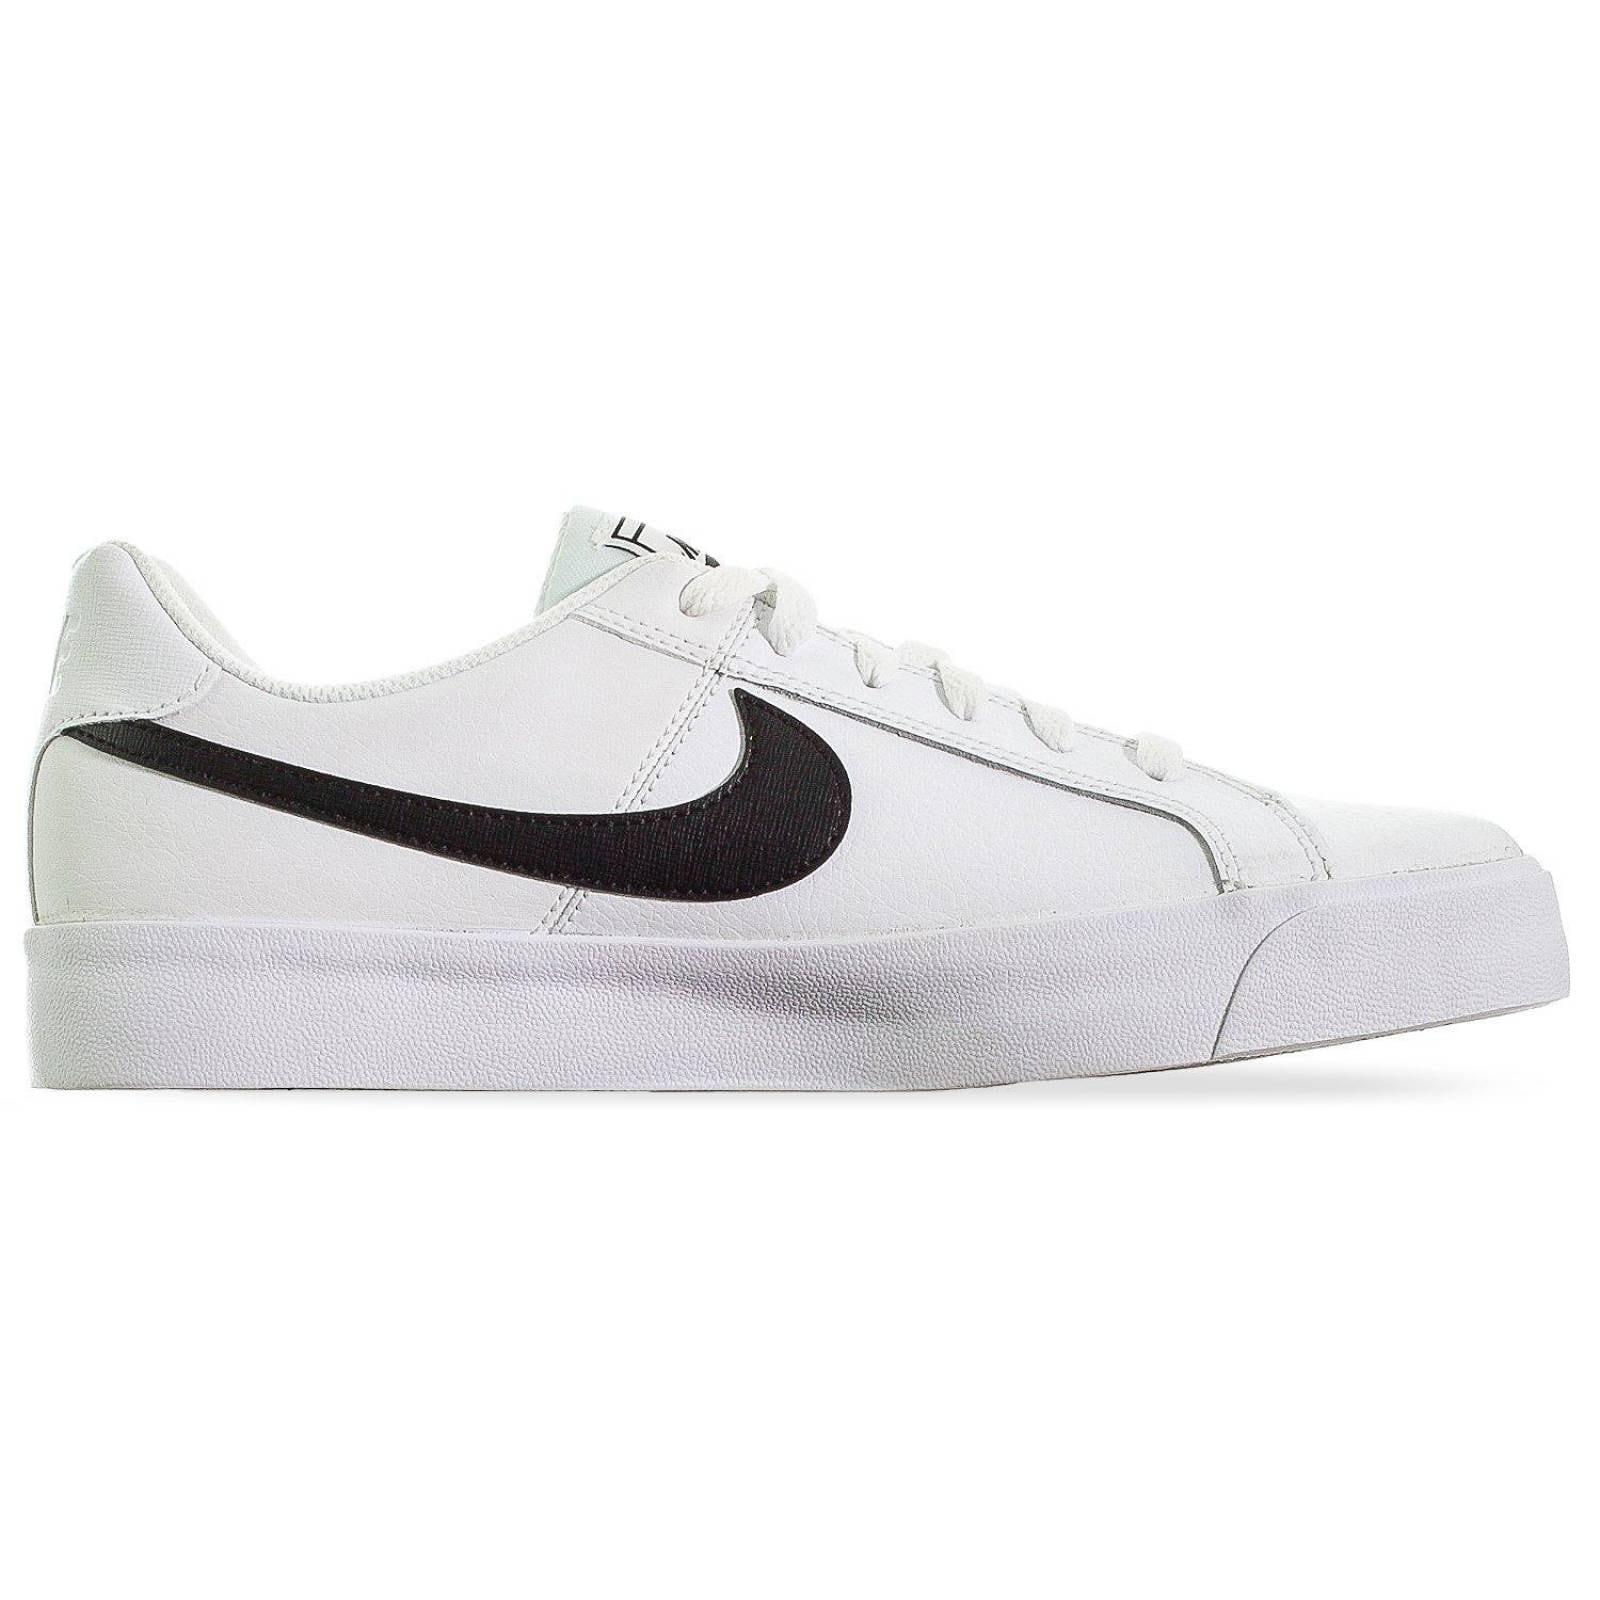 Religioso Fuerza Derecho  Tenis Nike Court Royale AC - BQ4222103 - Blanco - Hombre